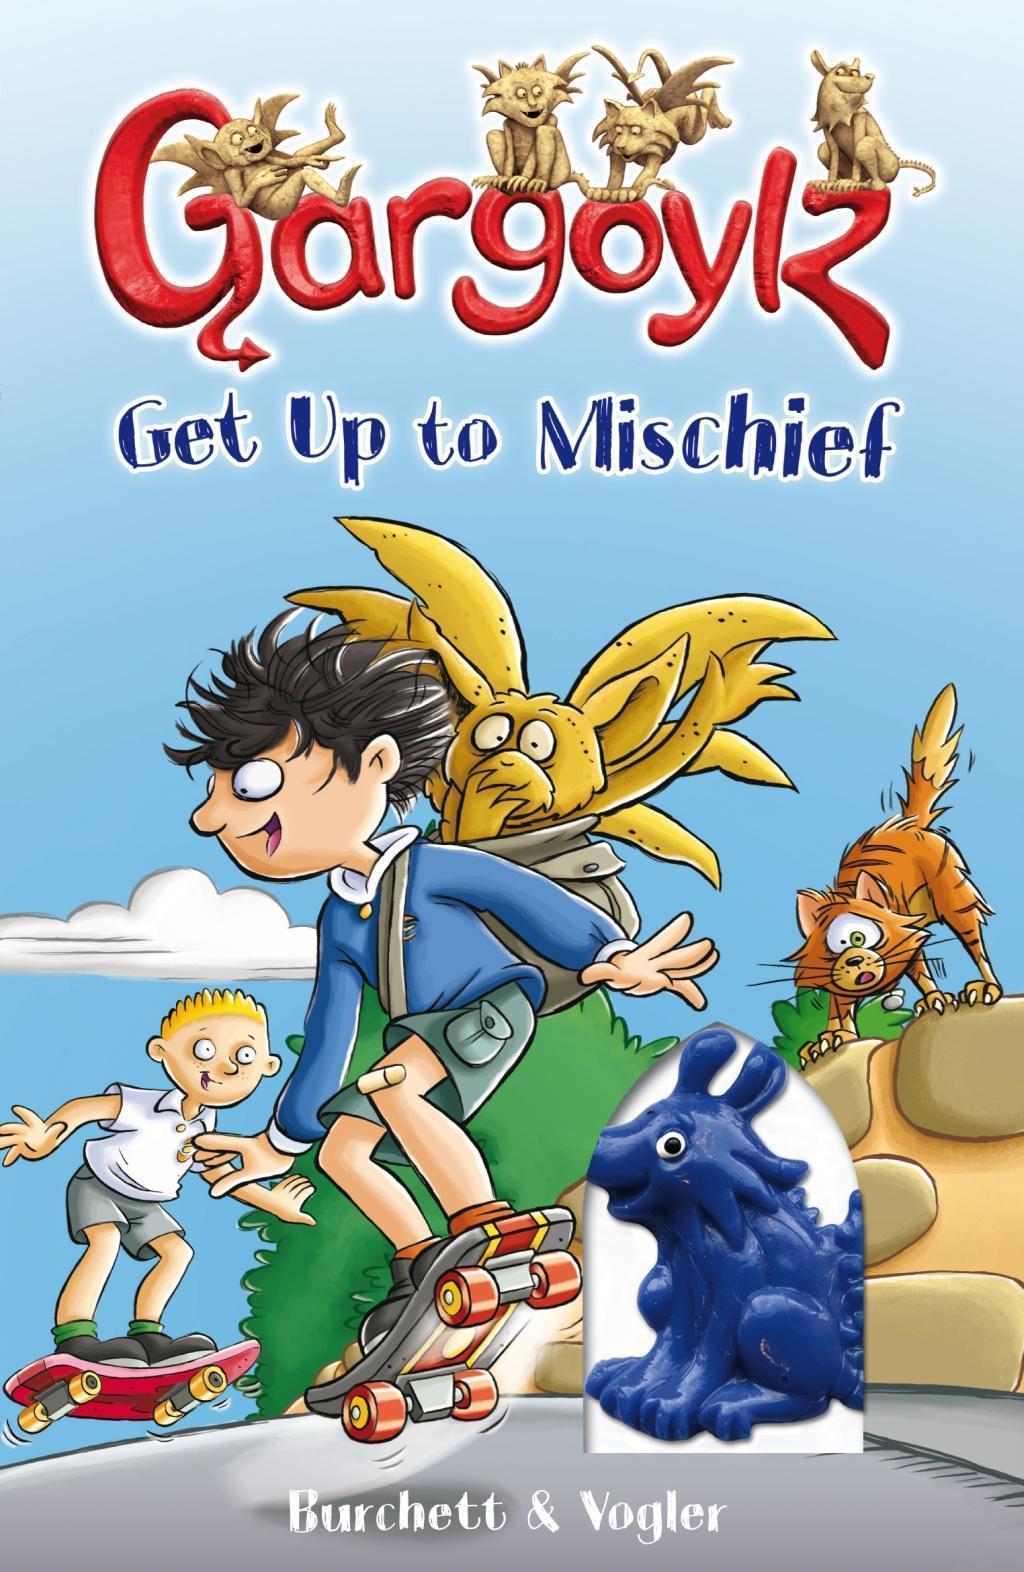 Gargoylz Get Up to Mischief